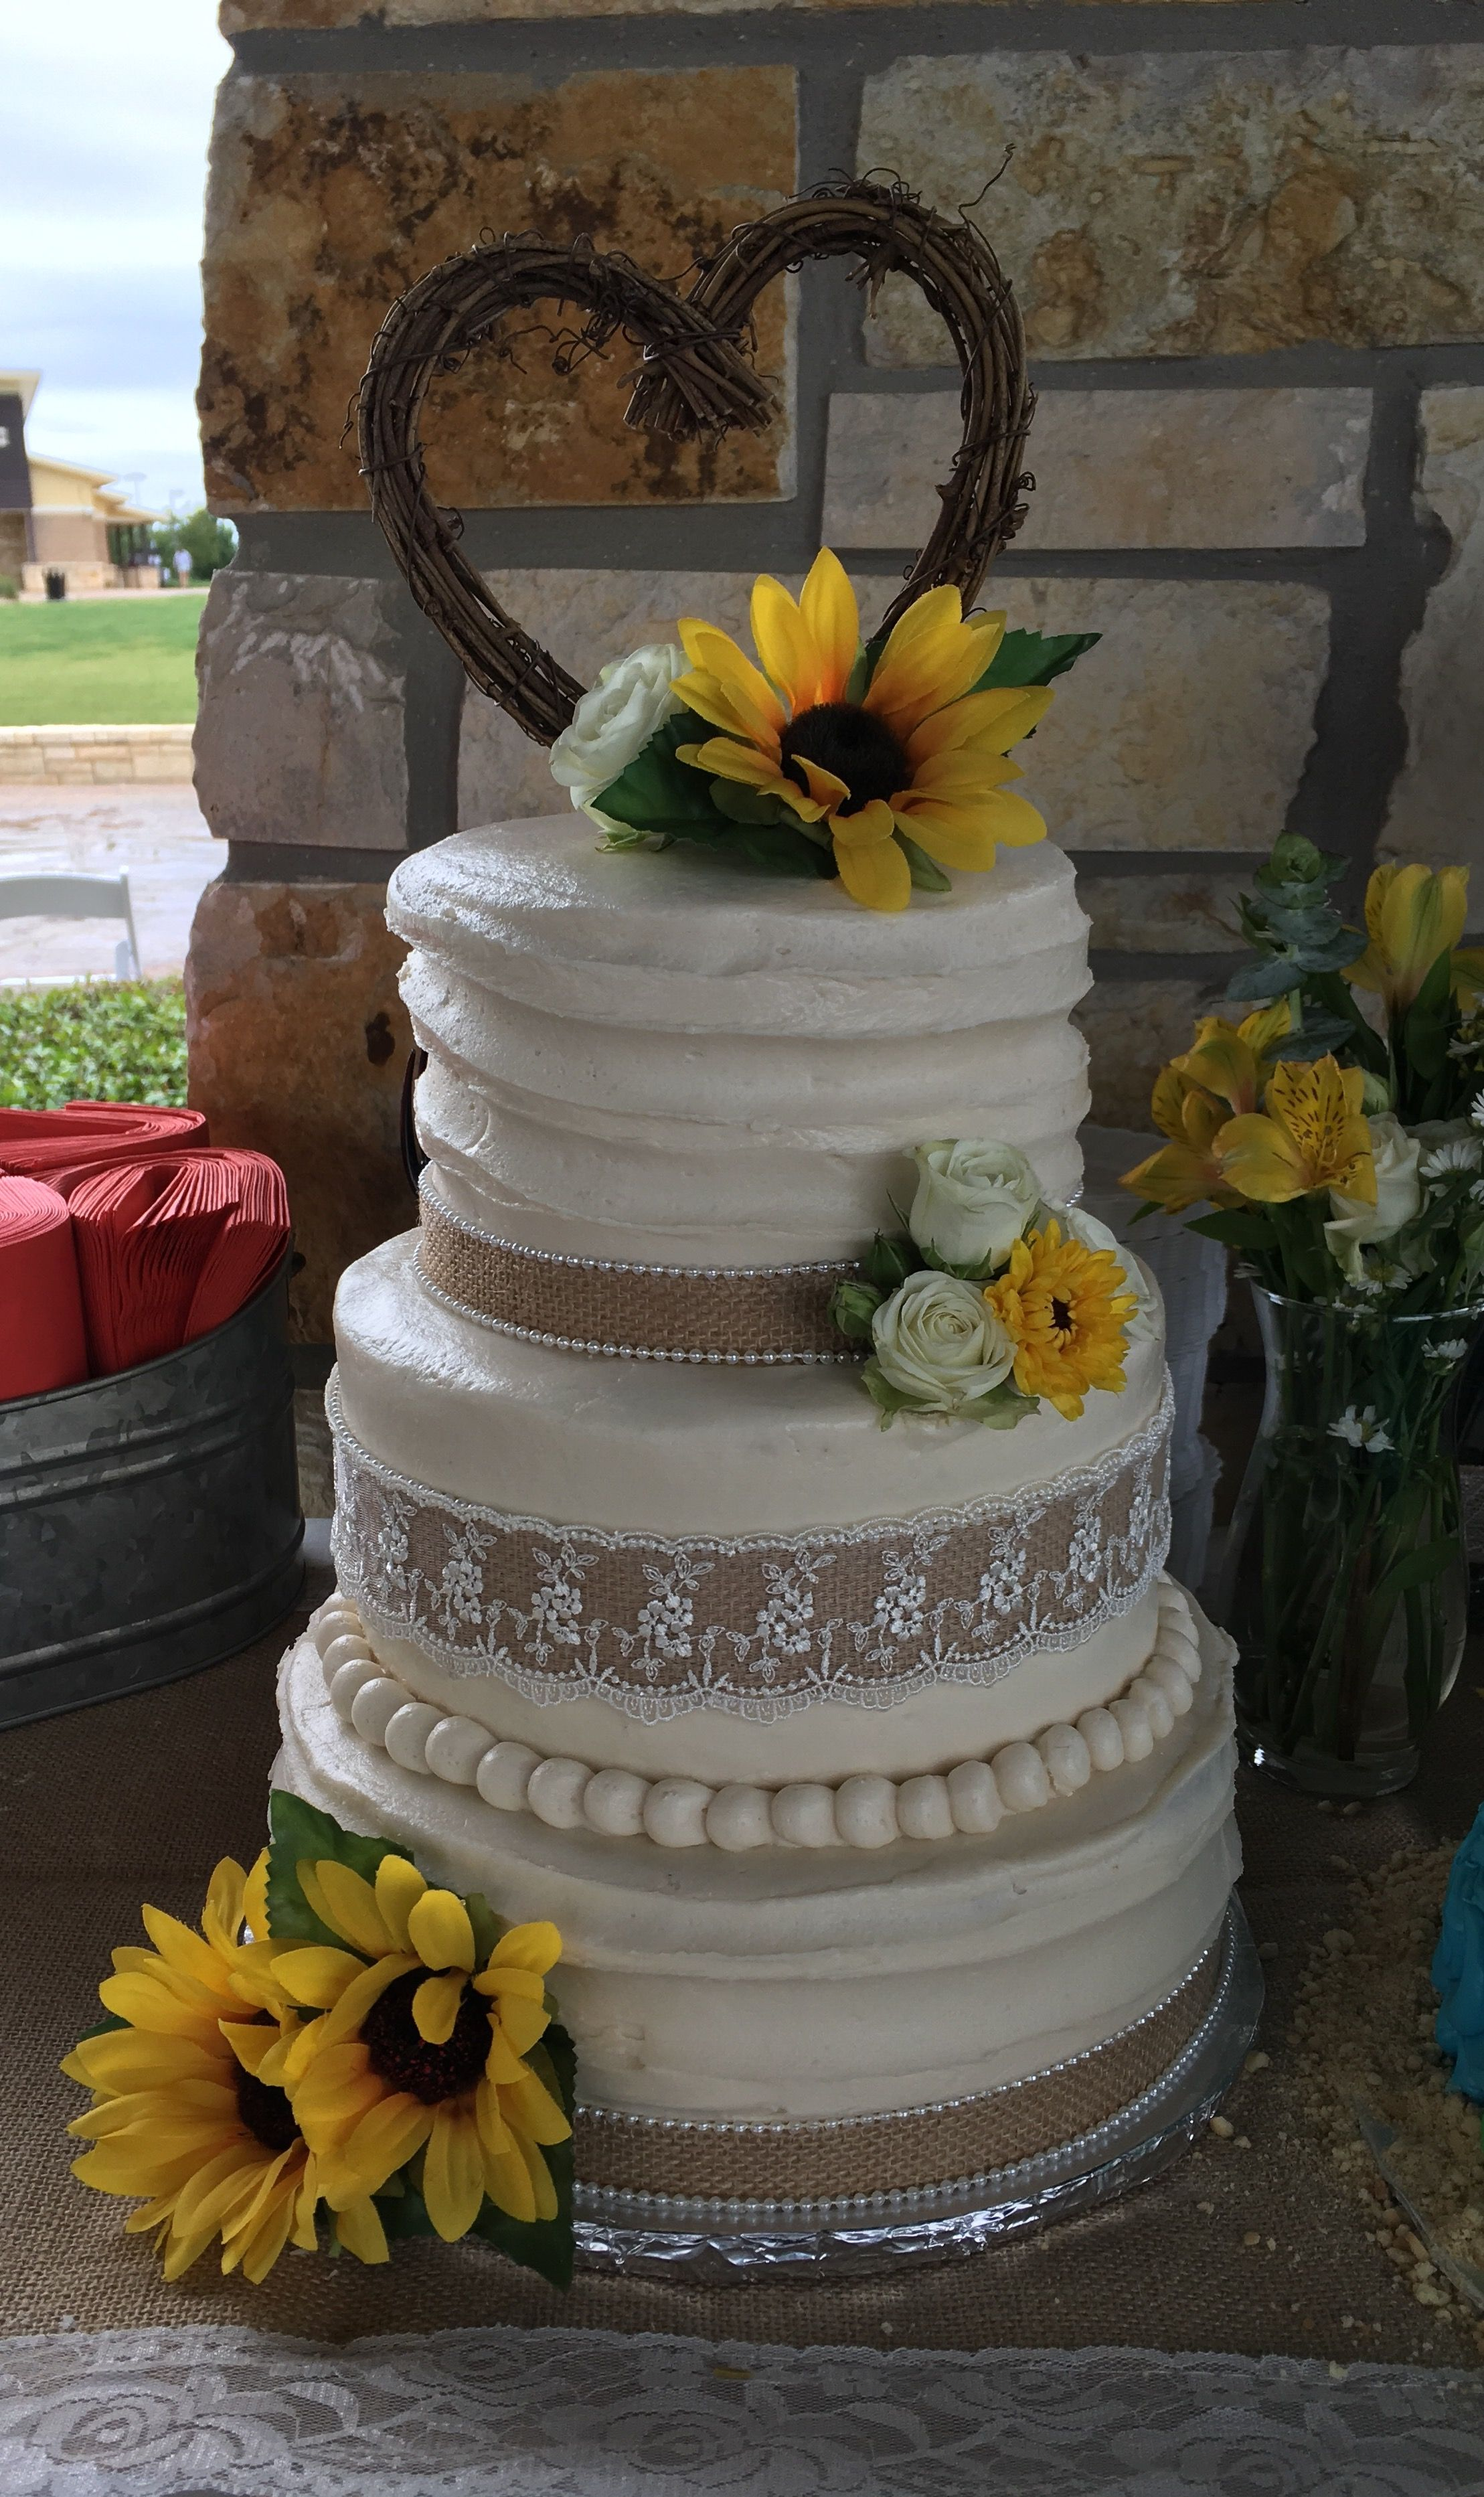 Burlap Lace Sunflower Rustic Wedding Cake Burlap wedding